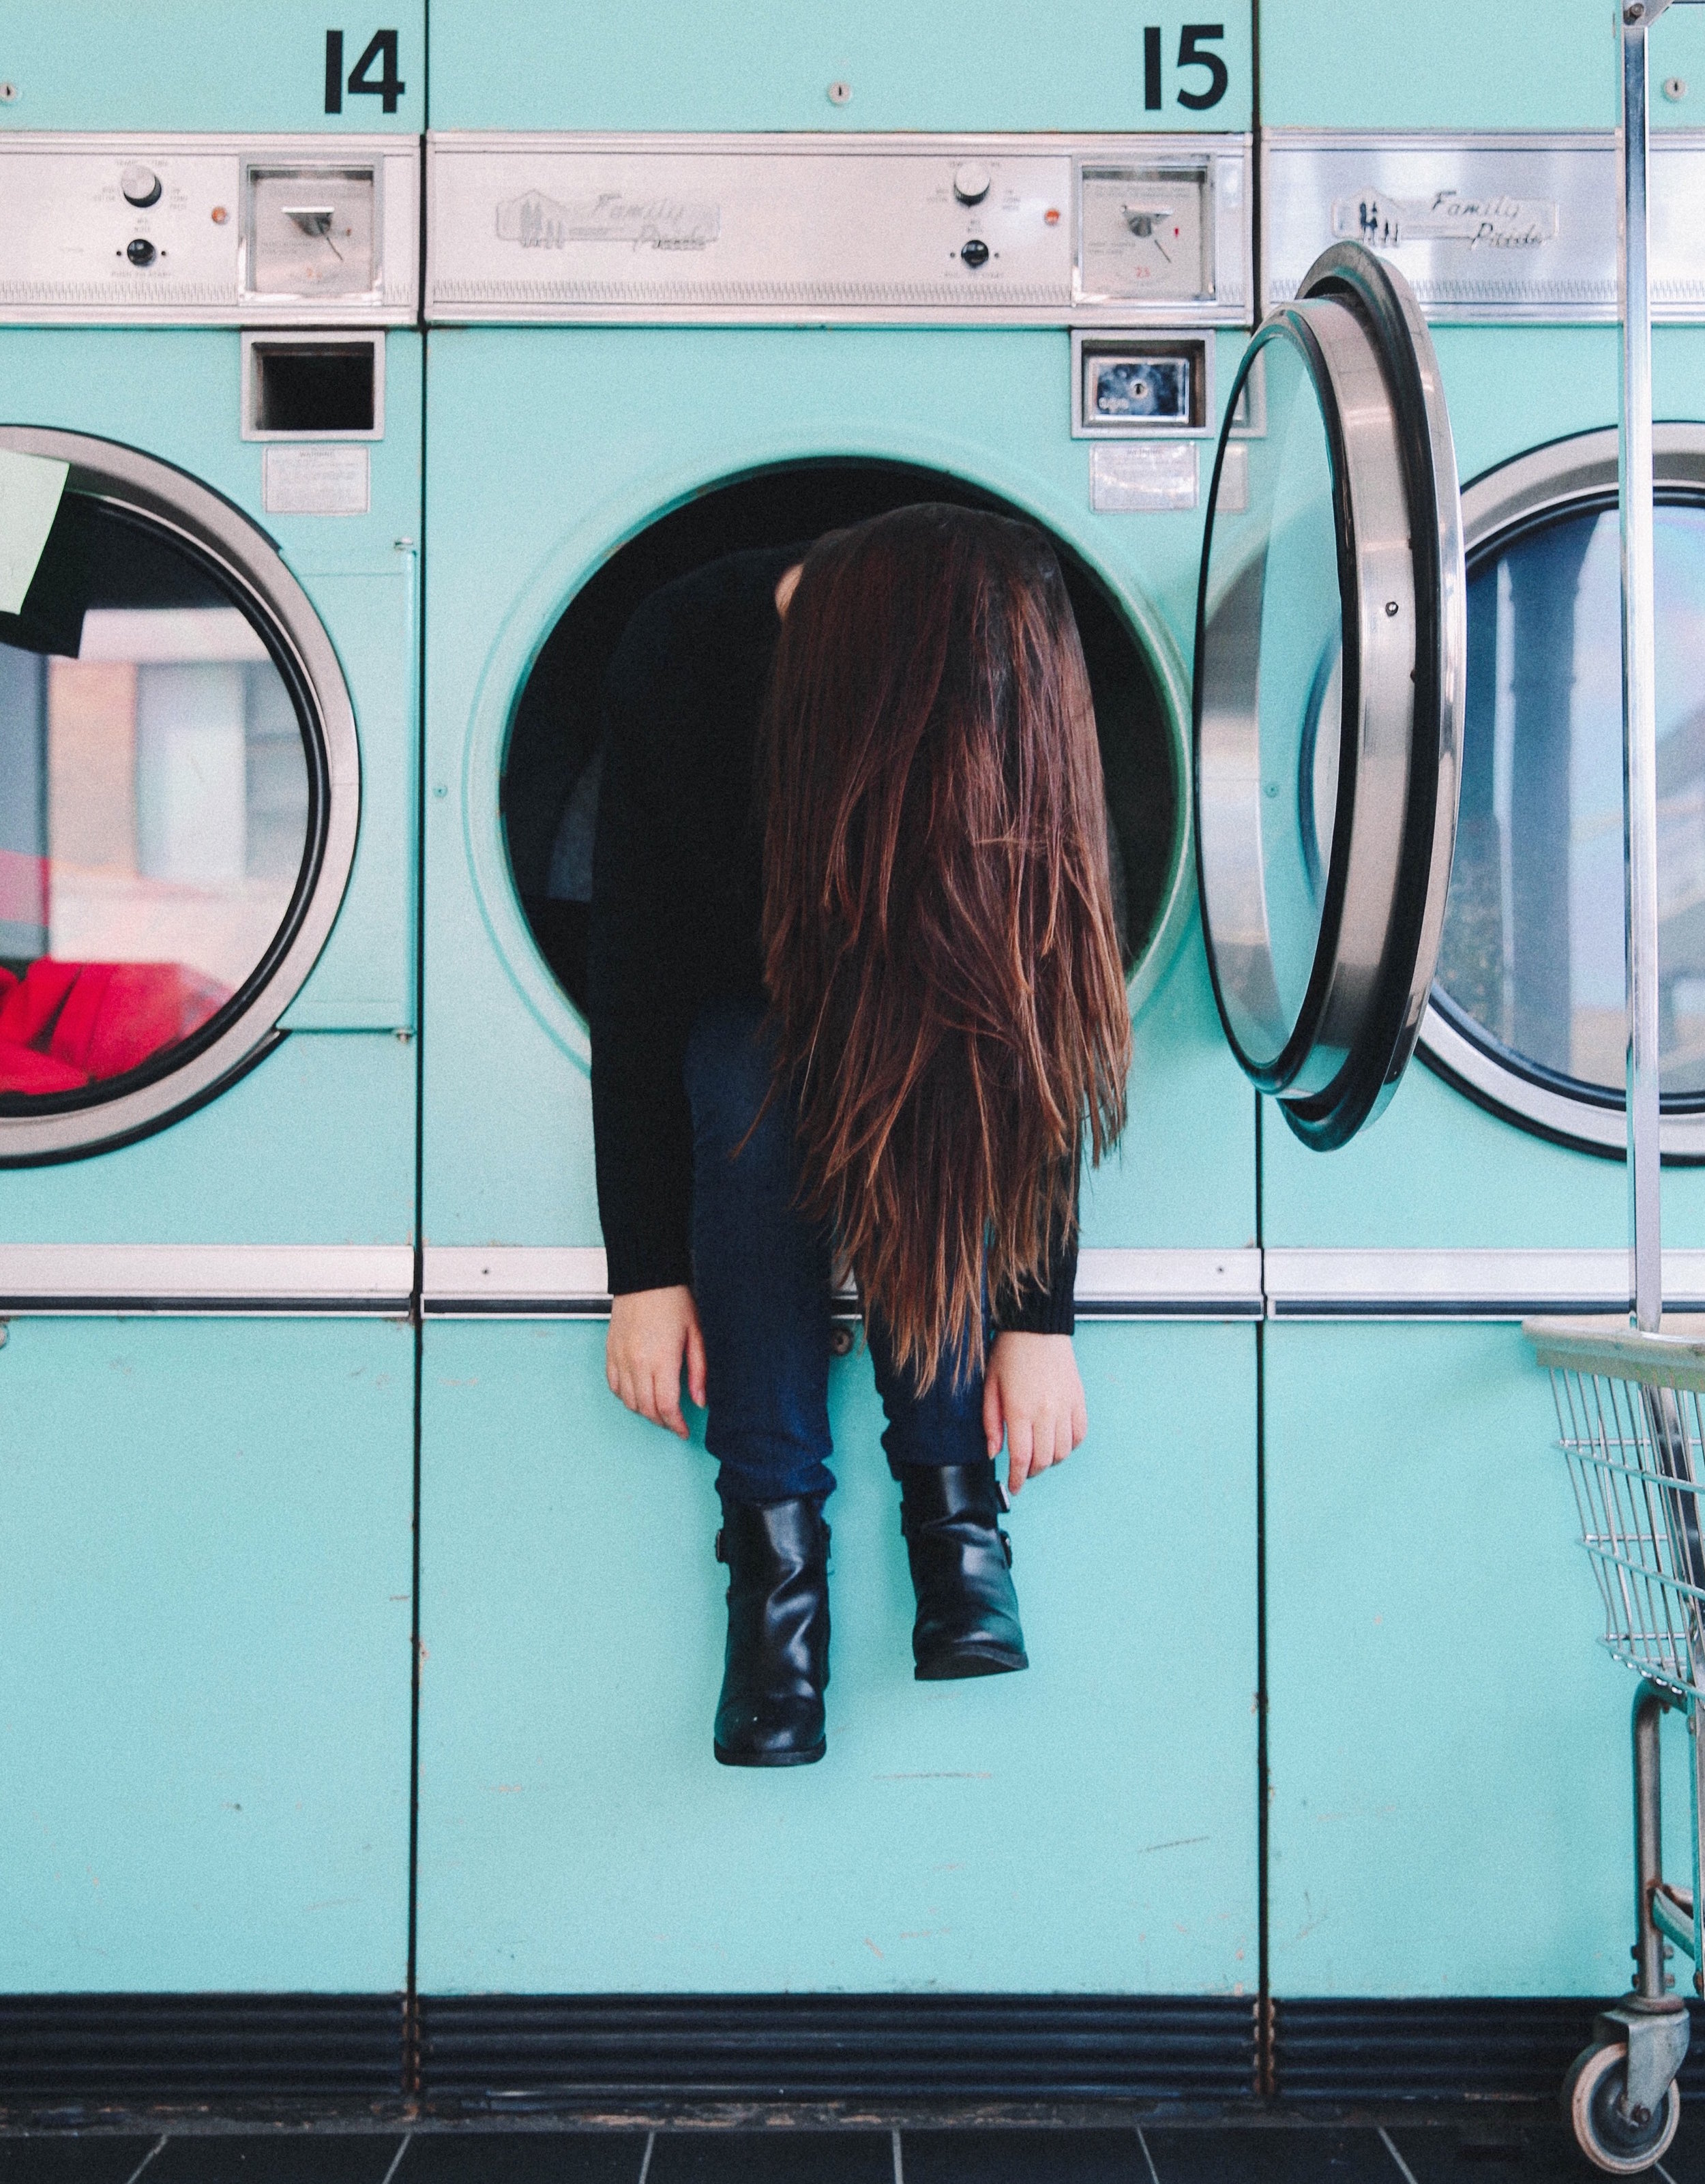 laundry matt, tired, gretchen has the floor